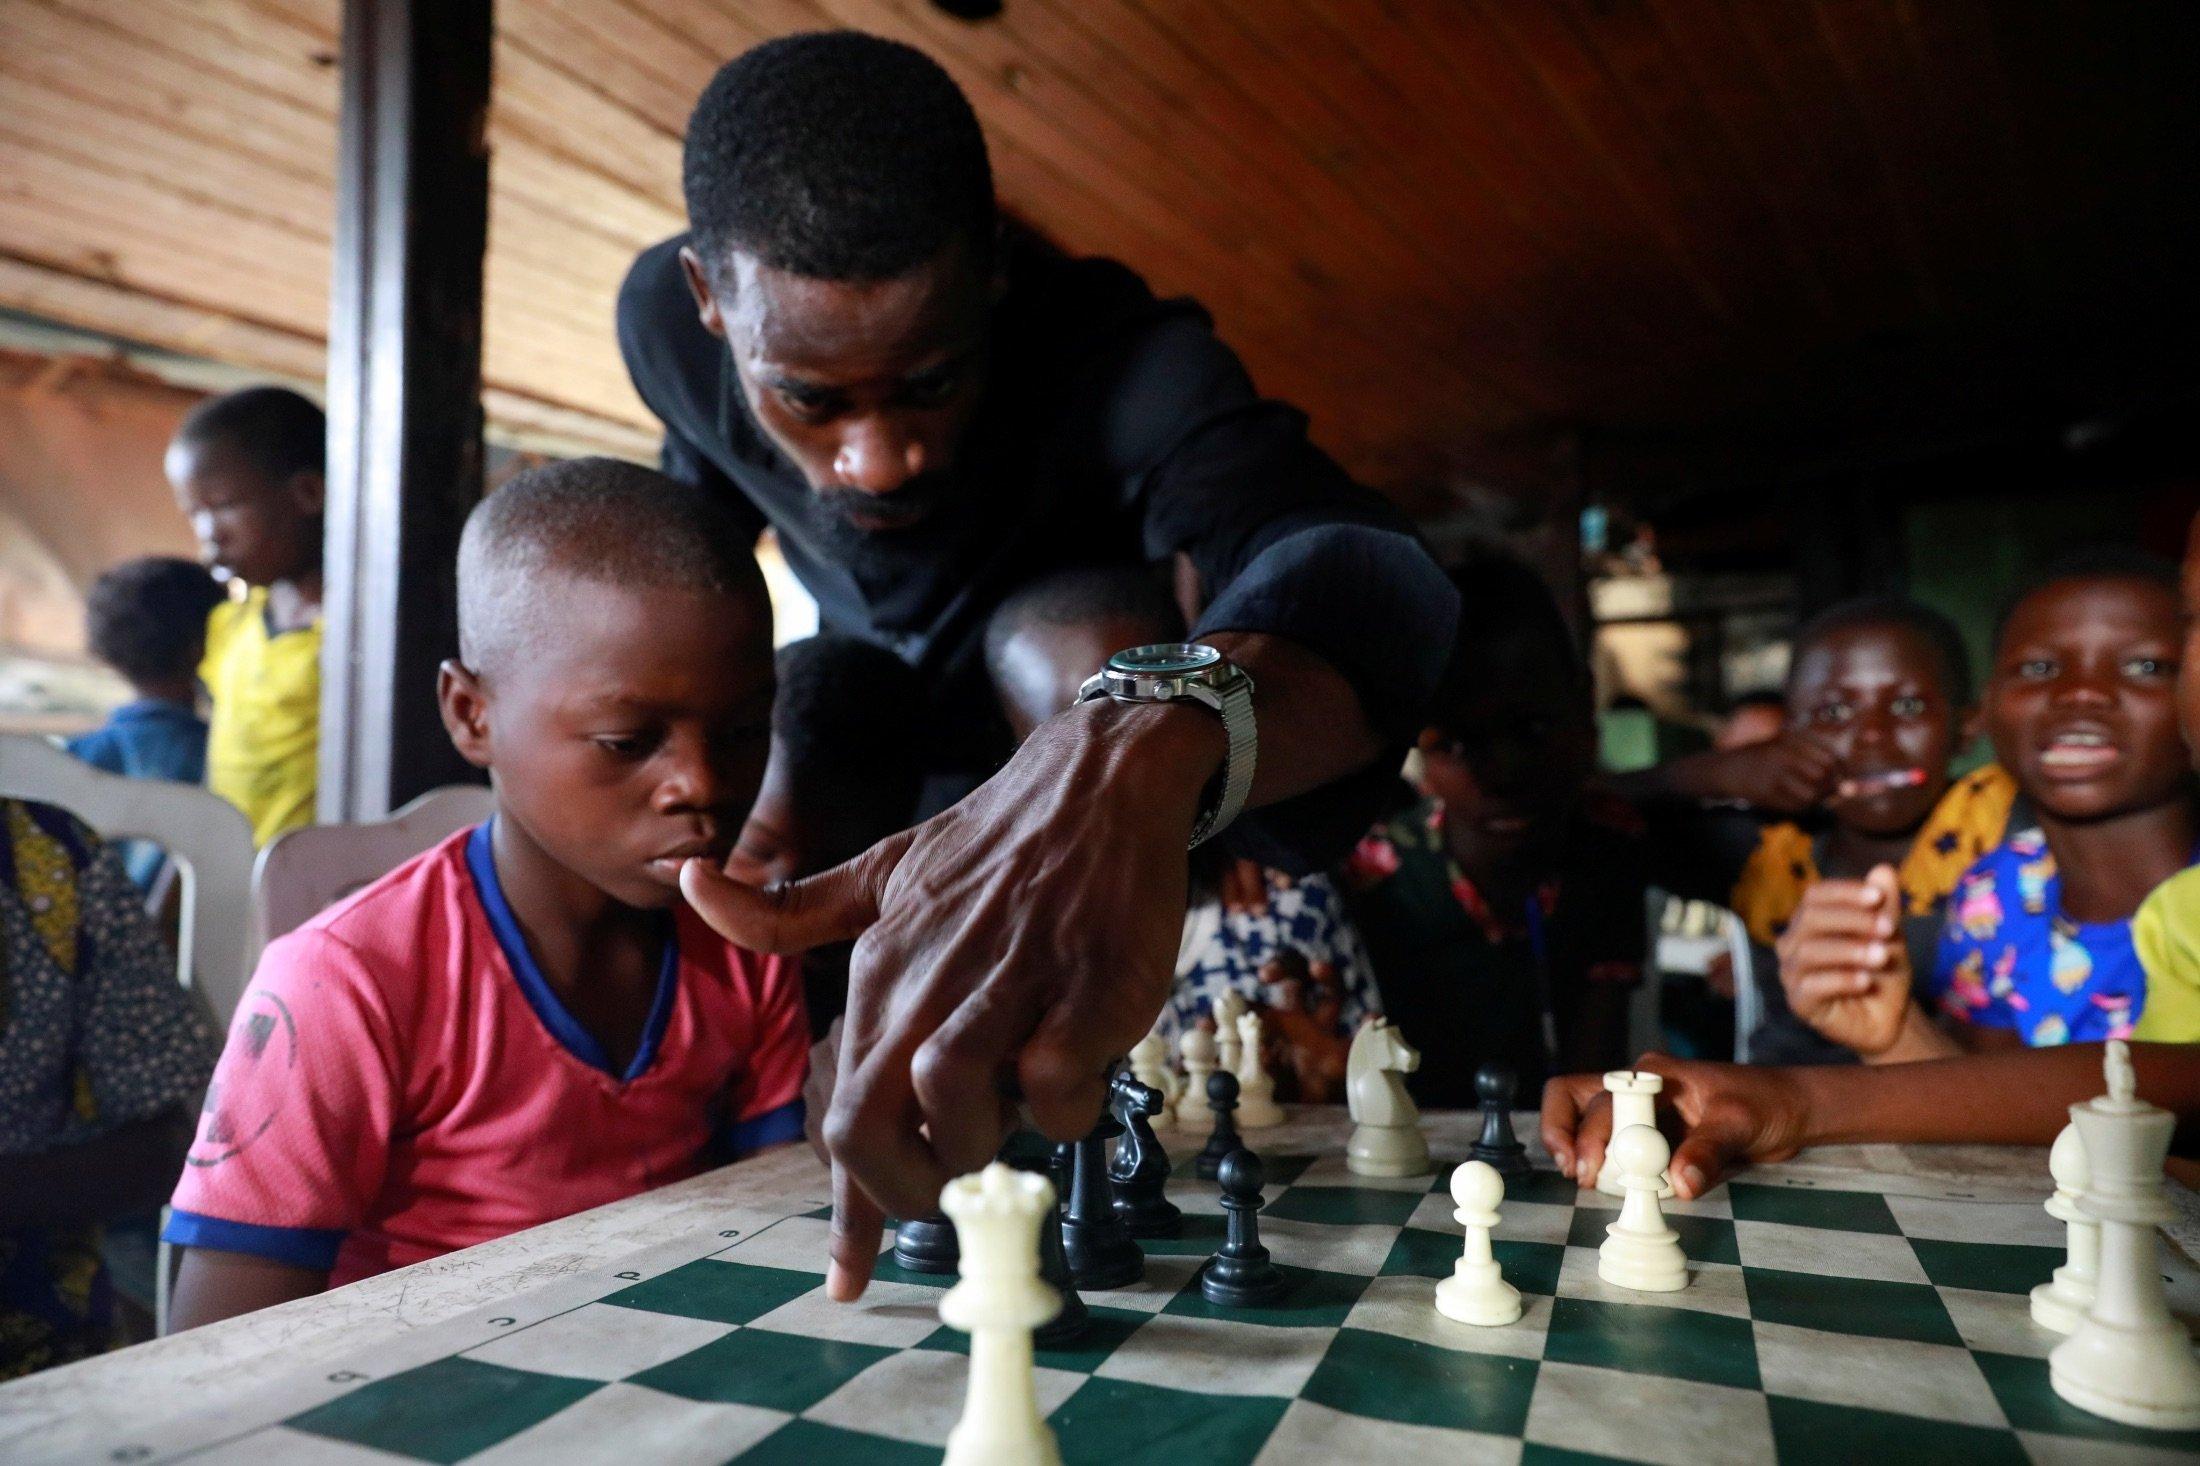 Babatunde Onakoya, 26, teaches children to play chess at a community palace in Makoko, Lagos, Nigeria, May 5, 2021. (Reuters Photo)